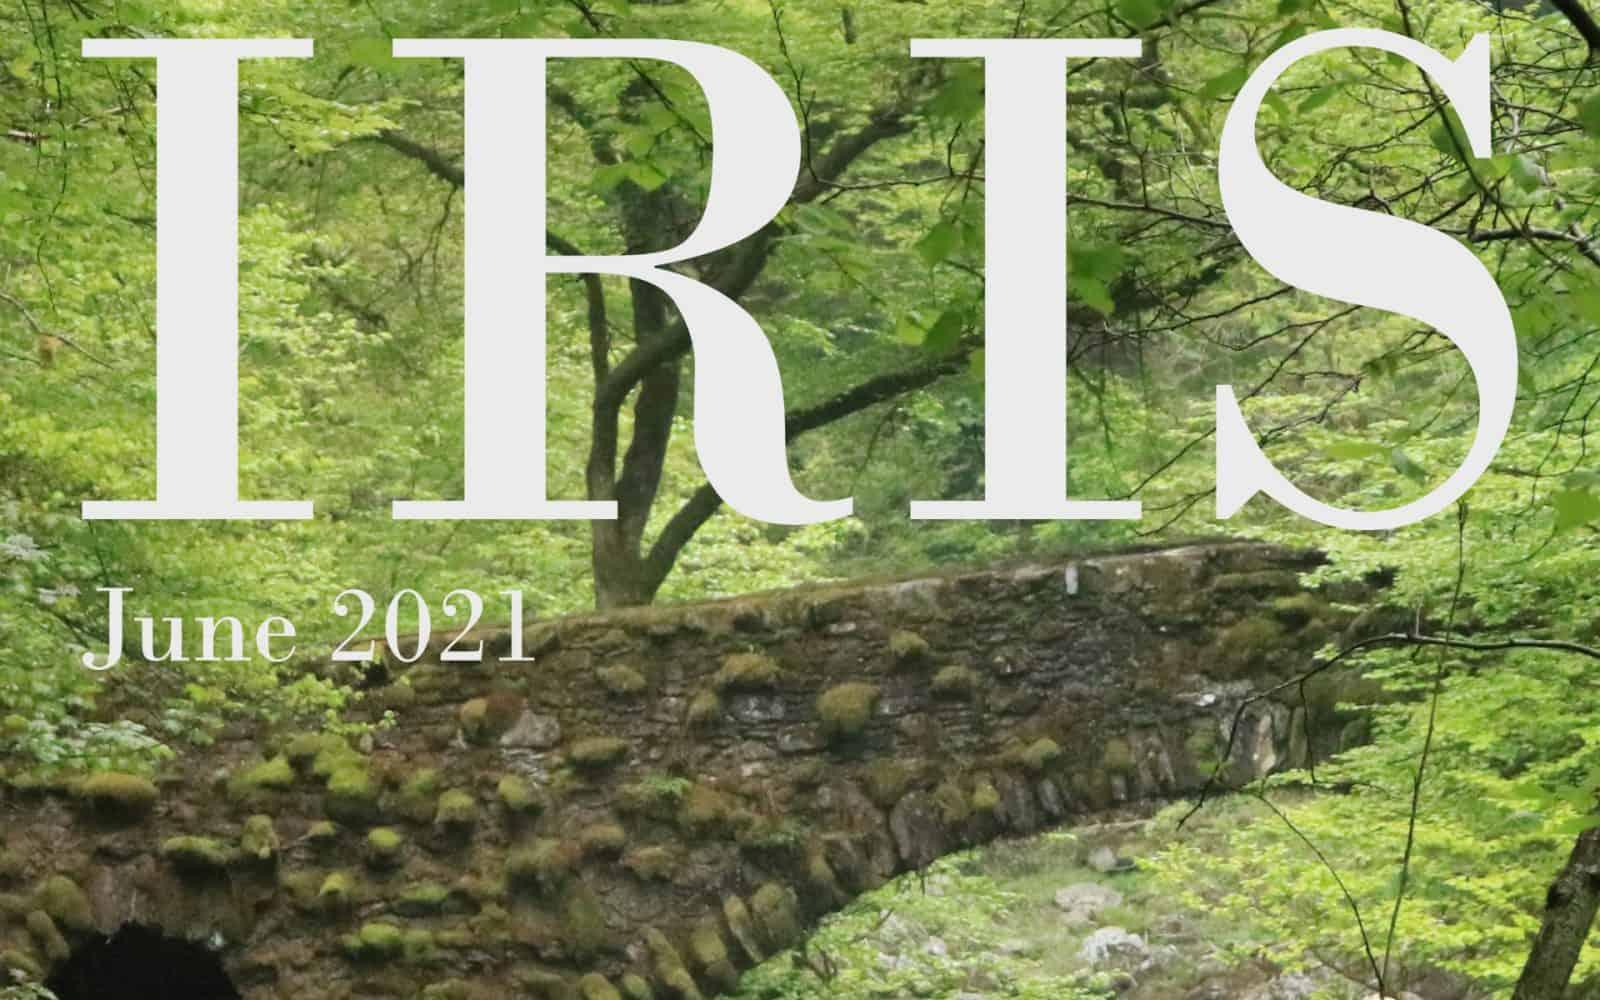 IRIS June 2021